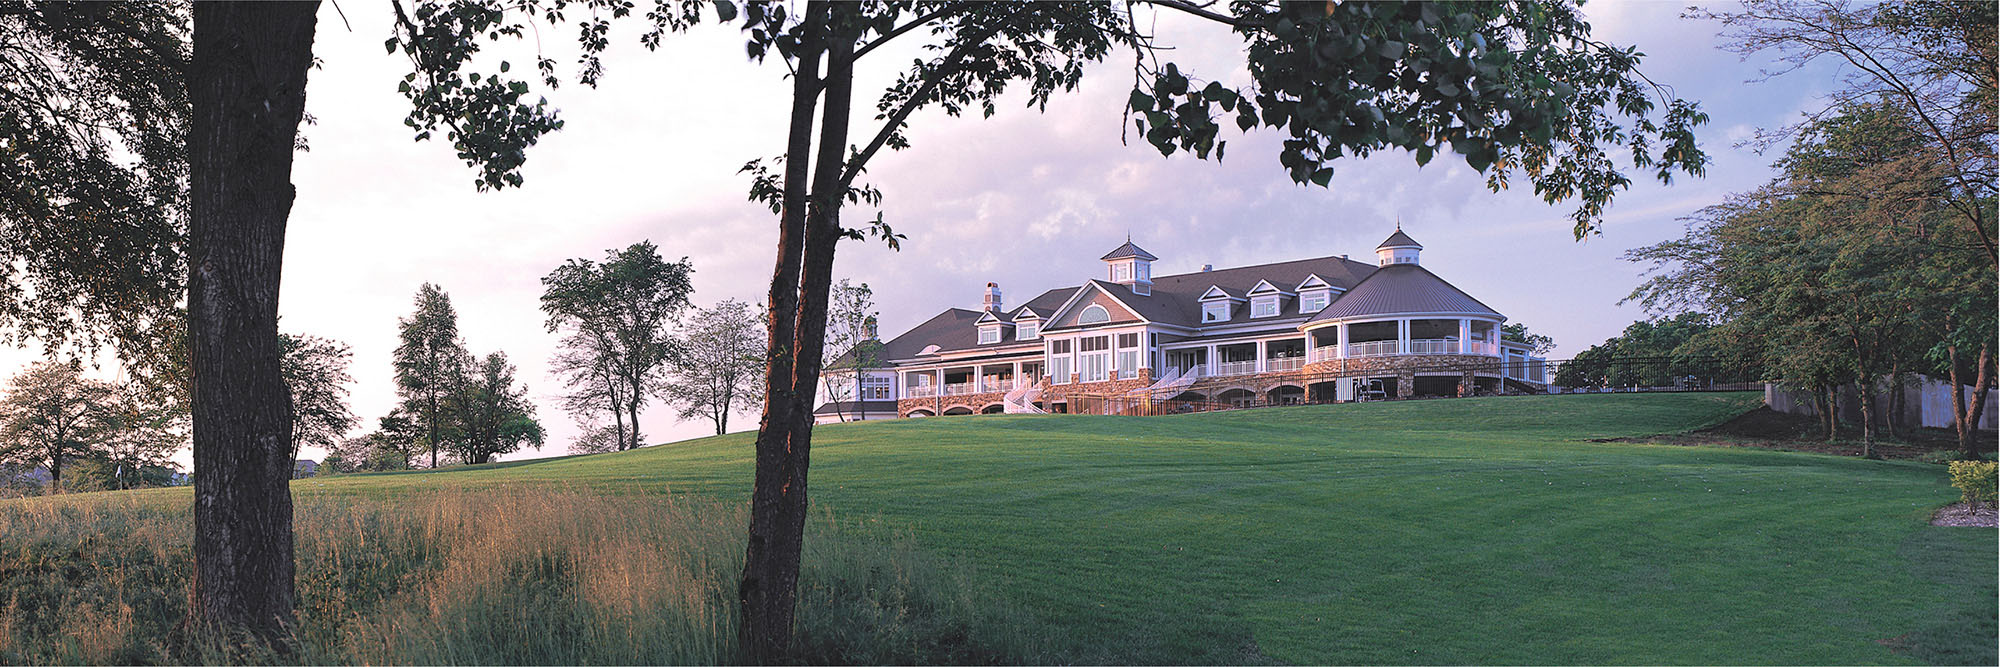 Golf Course Image - Glen Oaks Clubhouse